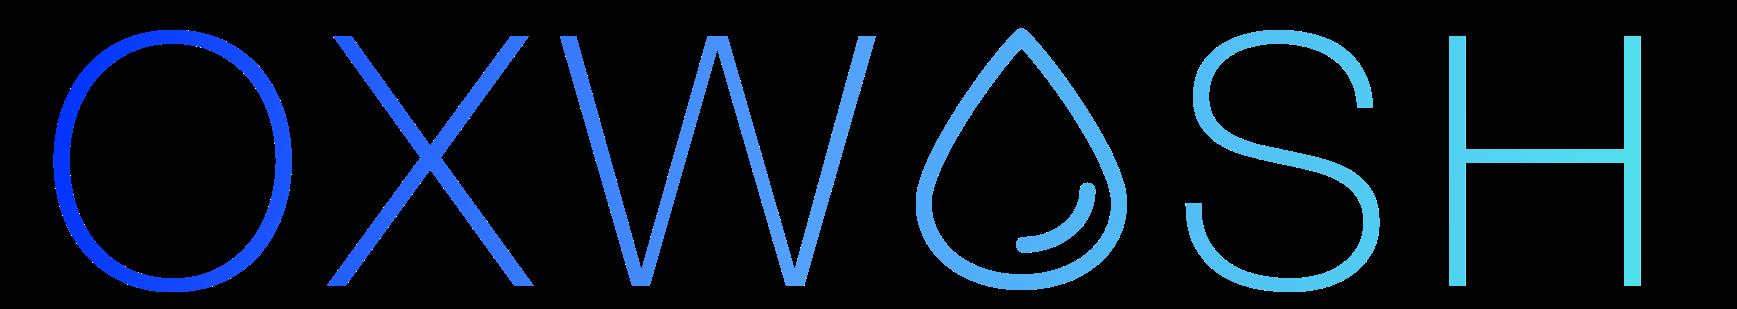 Oxwash logo blue gradient